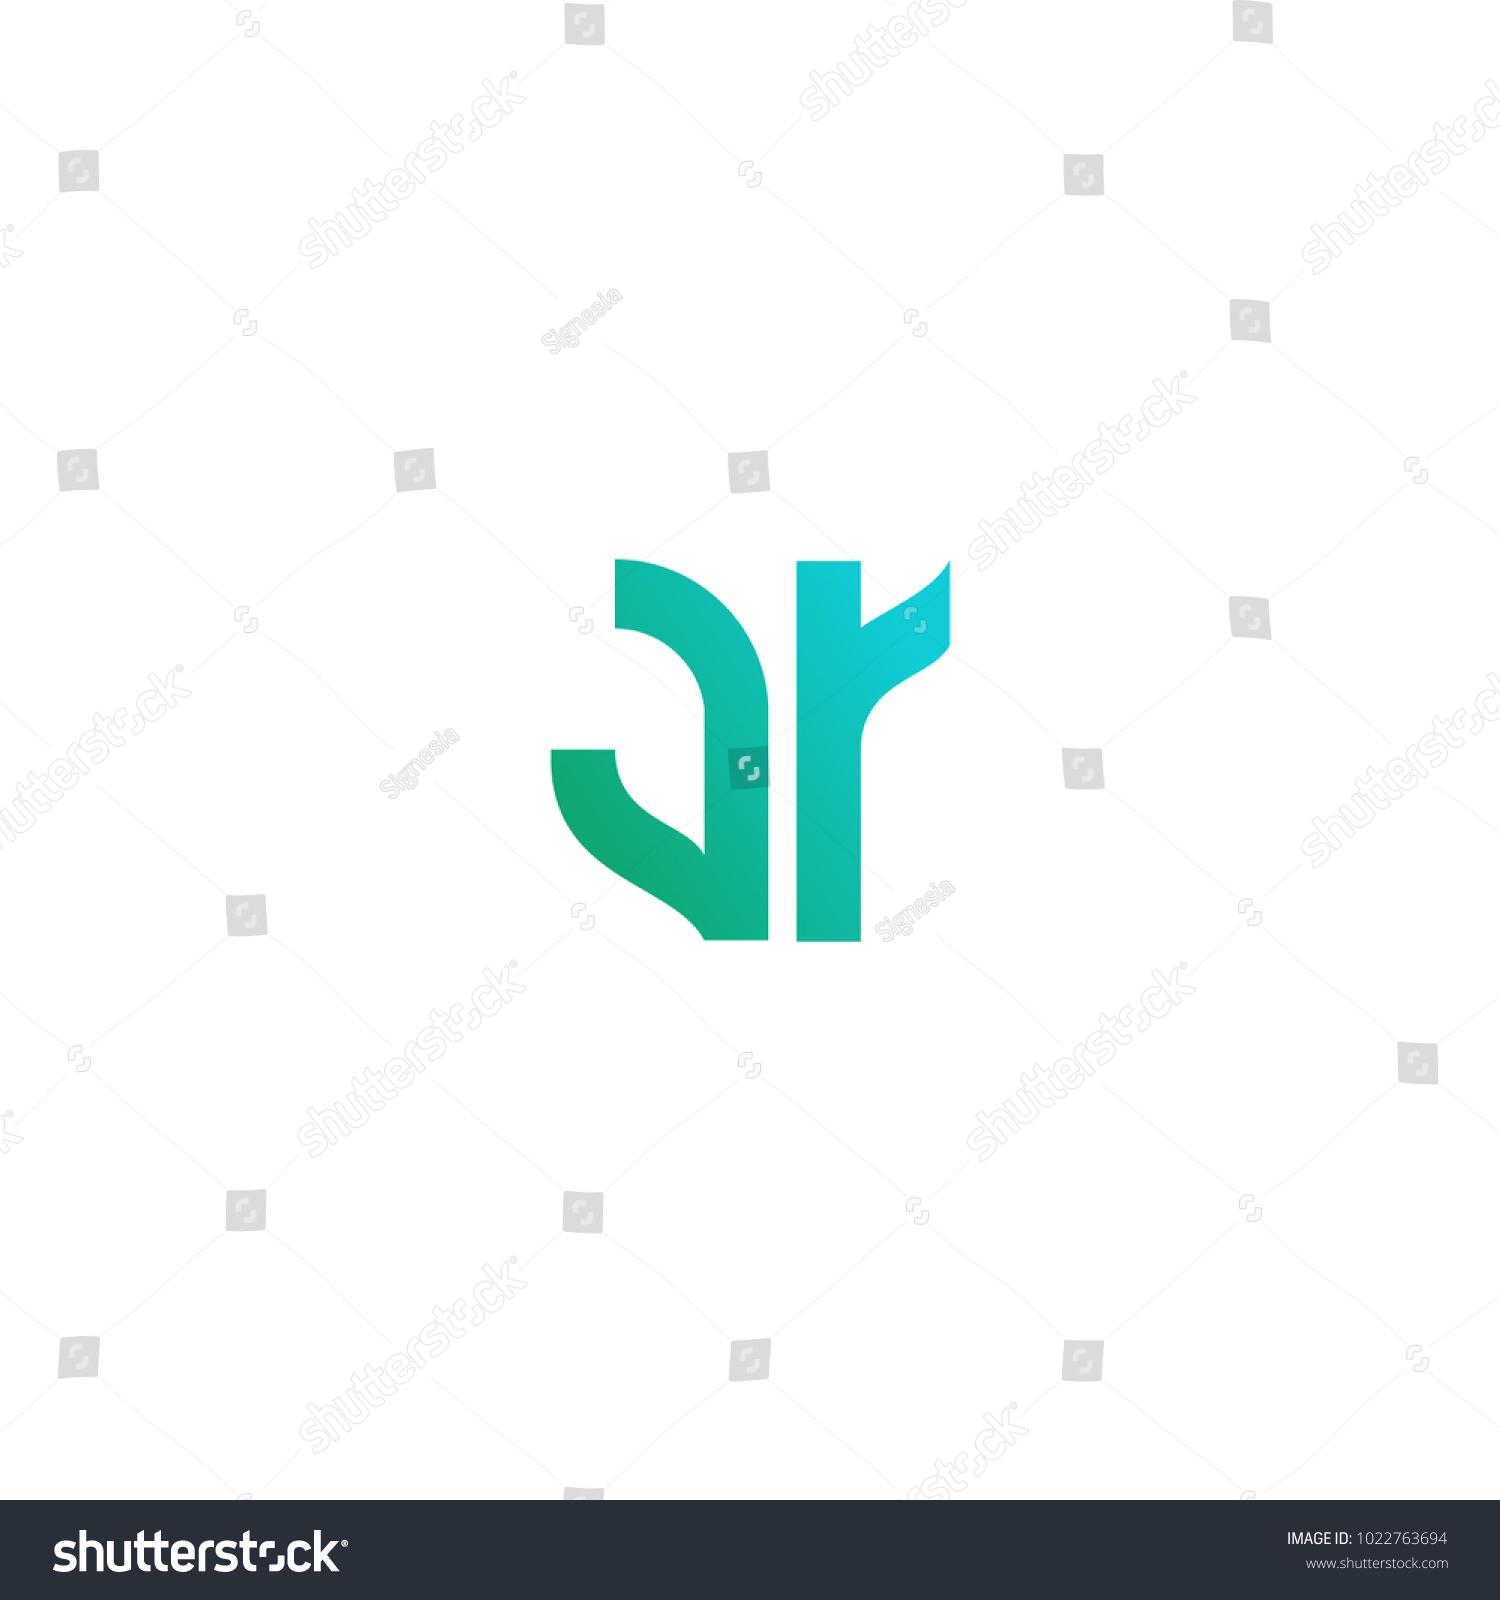 Letter Ar Logo Design Creative Alphabet Stock Vector 1022763694 ... for Logo Design For Alphabets  570bof